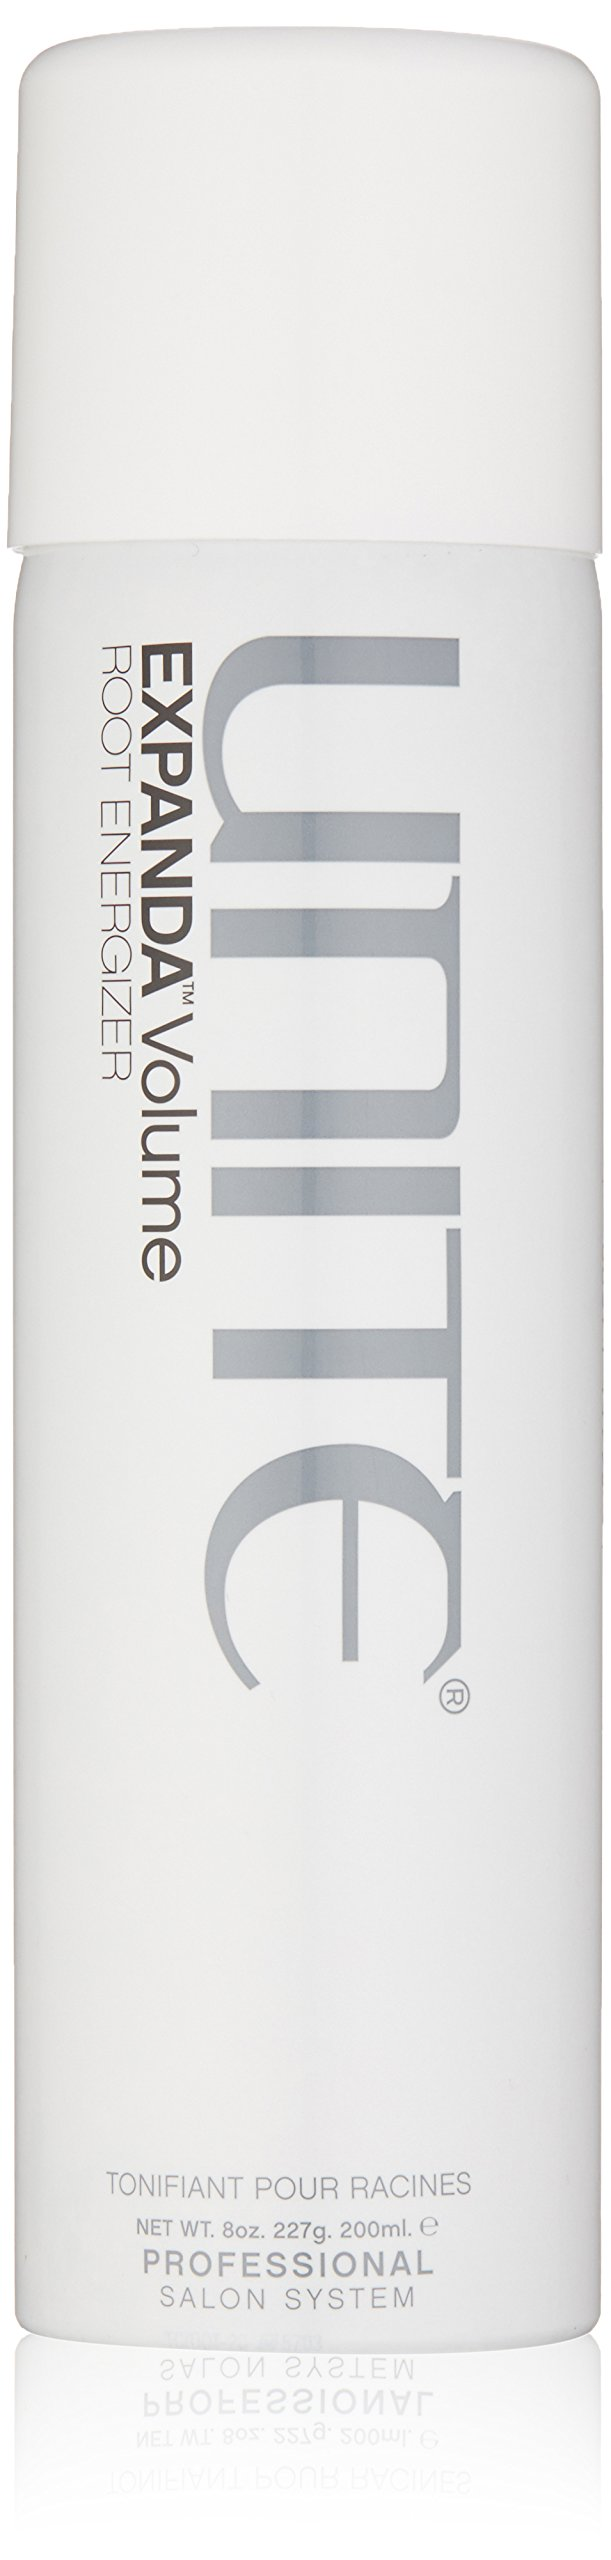 UNITE Hair Expanda Volume Root Energizer, 8 Fl oz